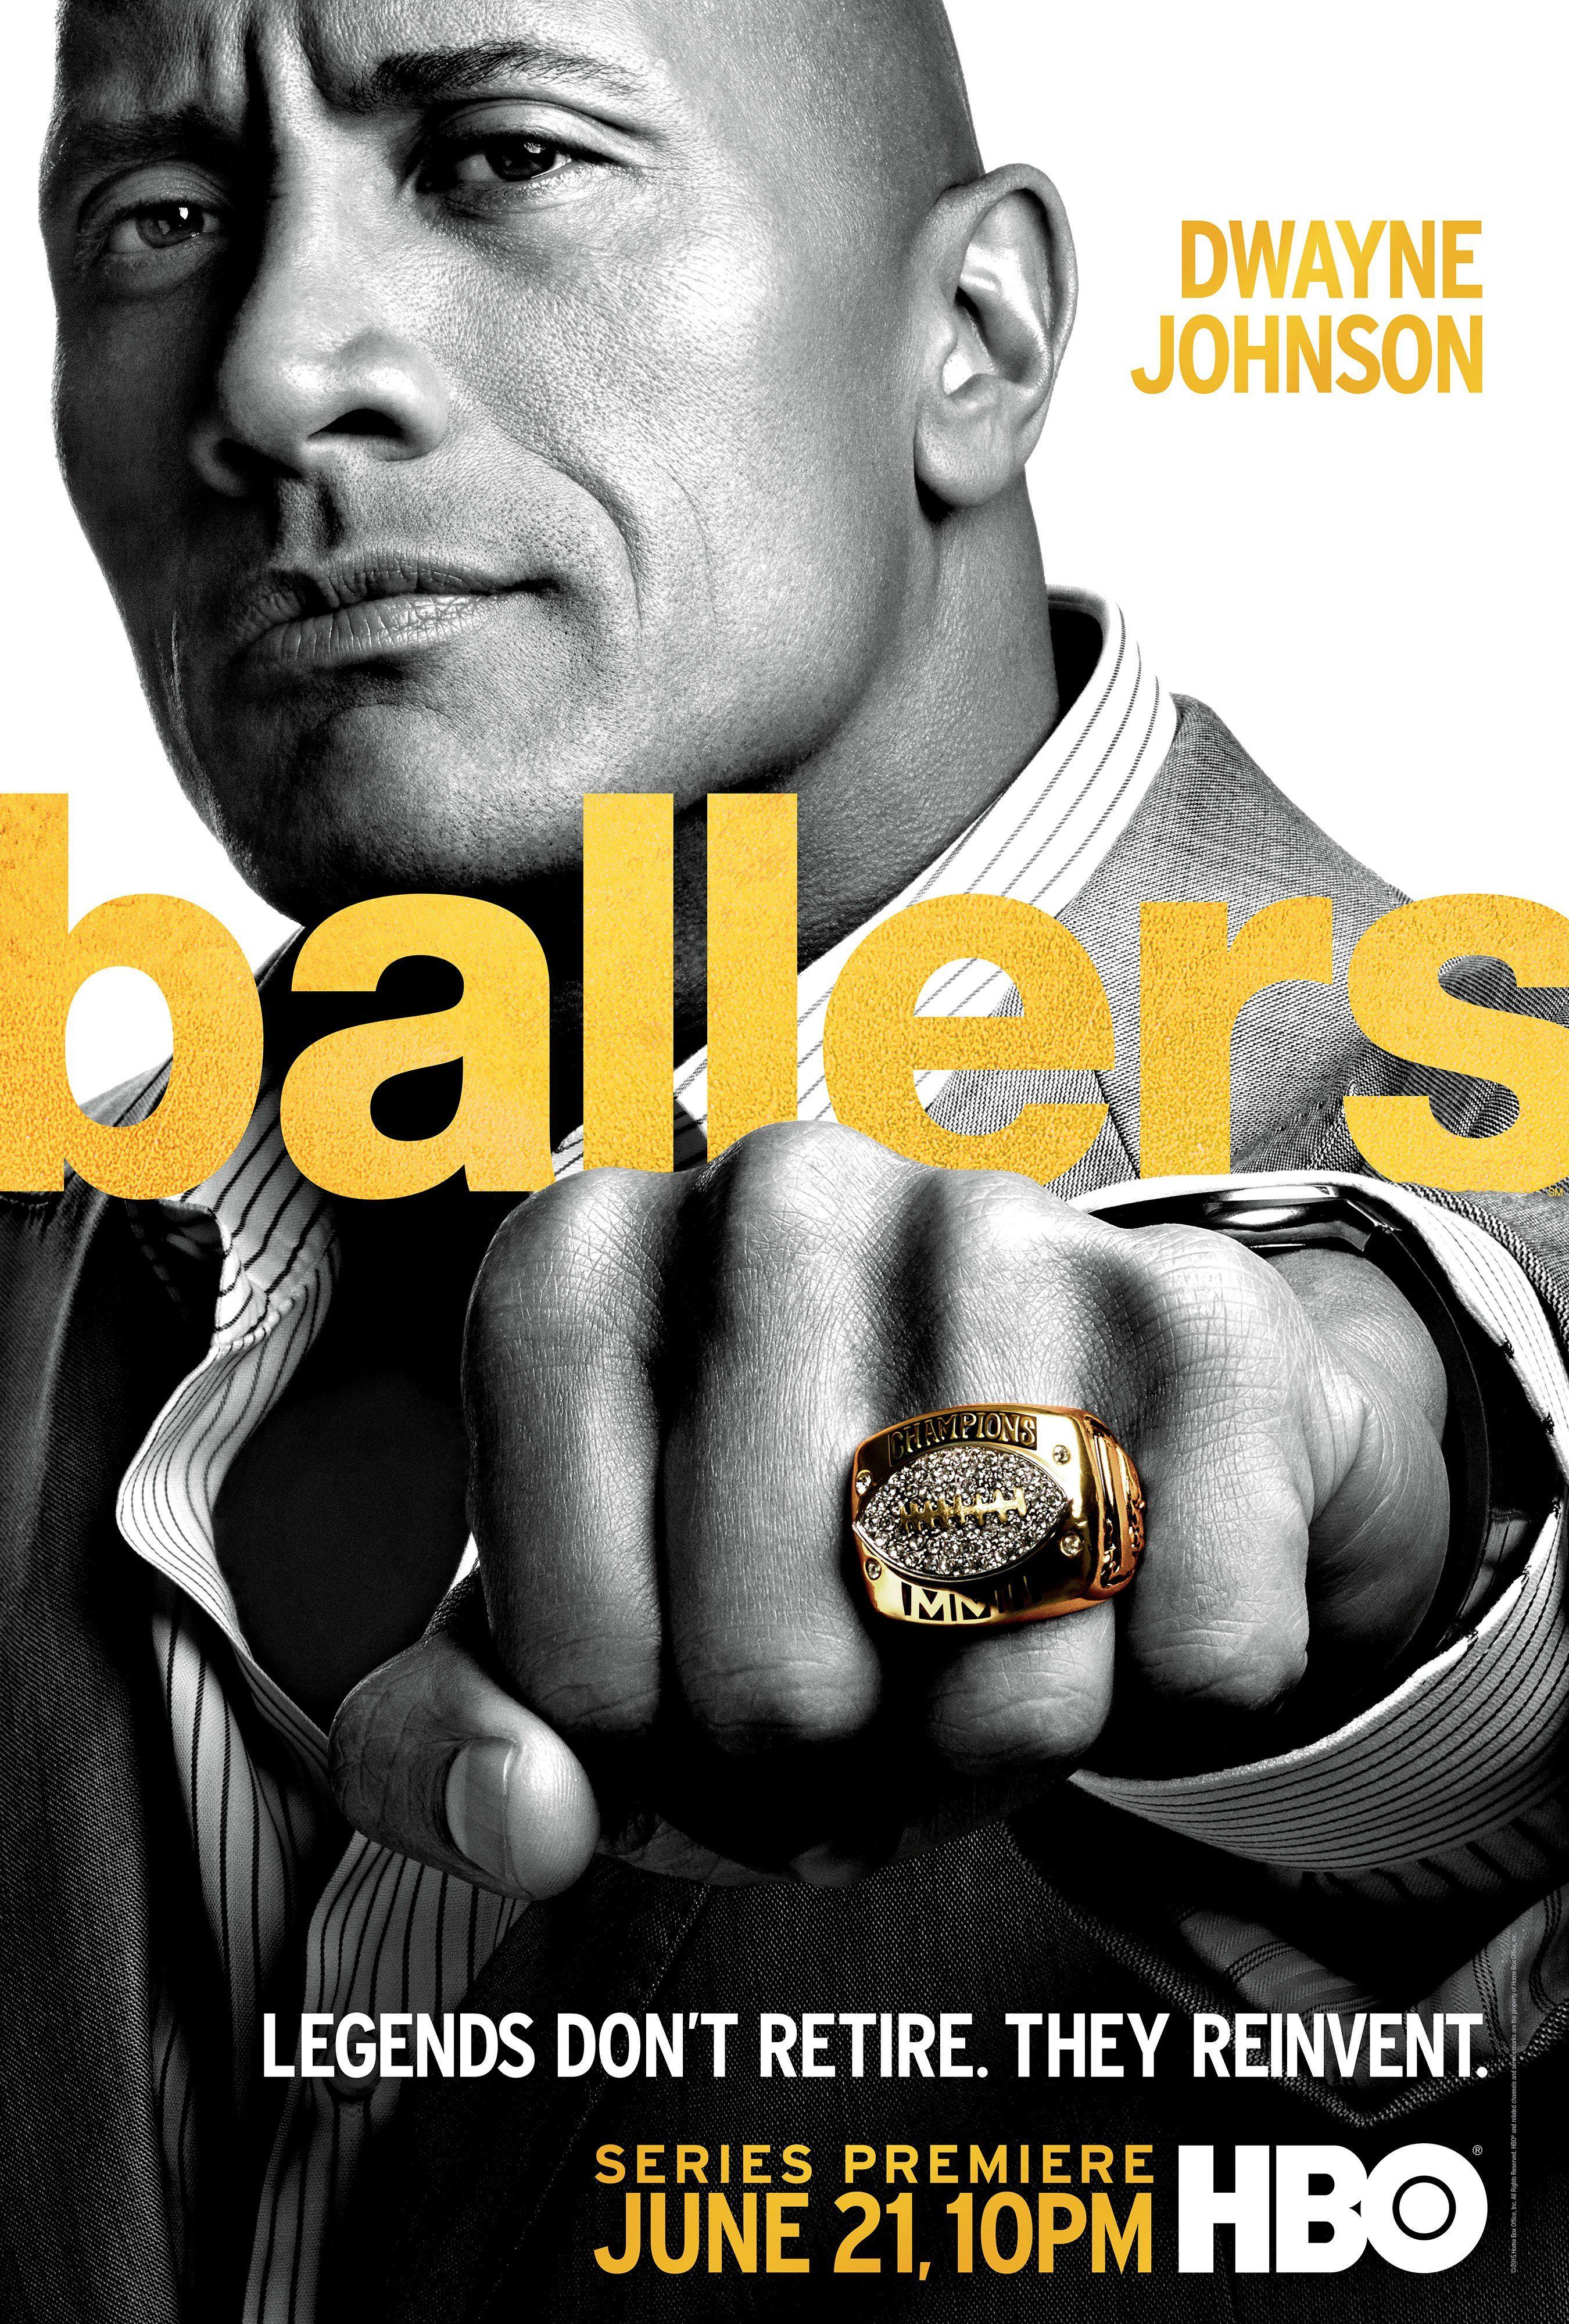 Ballers 3 Sezon 2 Bolum Full Hd Turkce Altyazi Izle Dwayne Johnson The Rock Dwayne Johnson Hbo